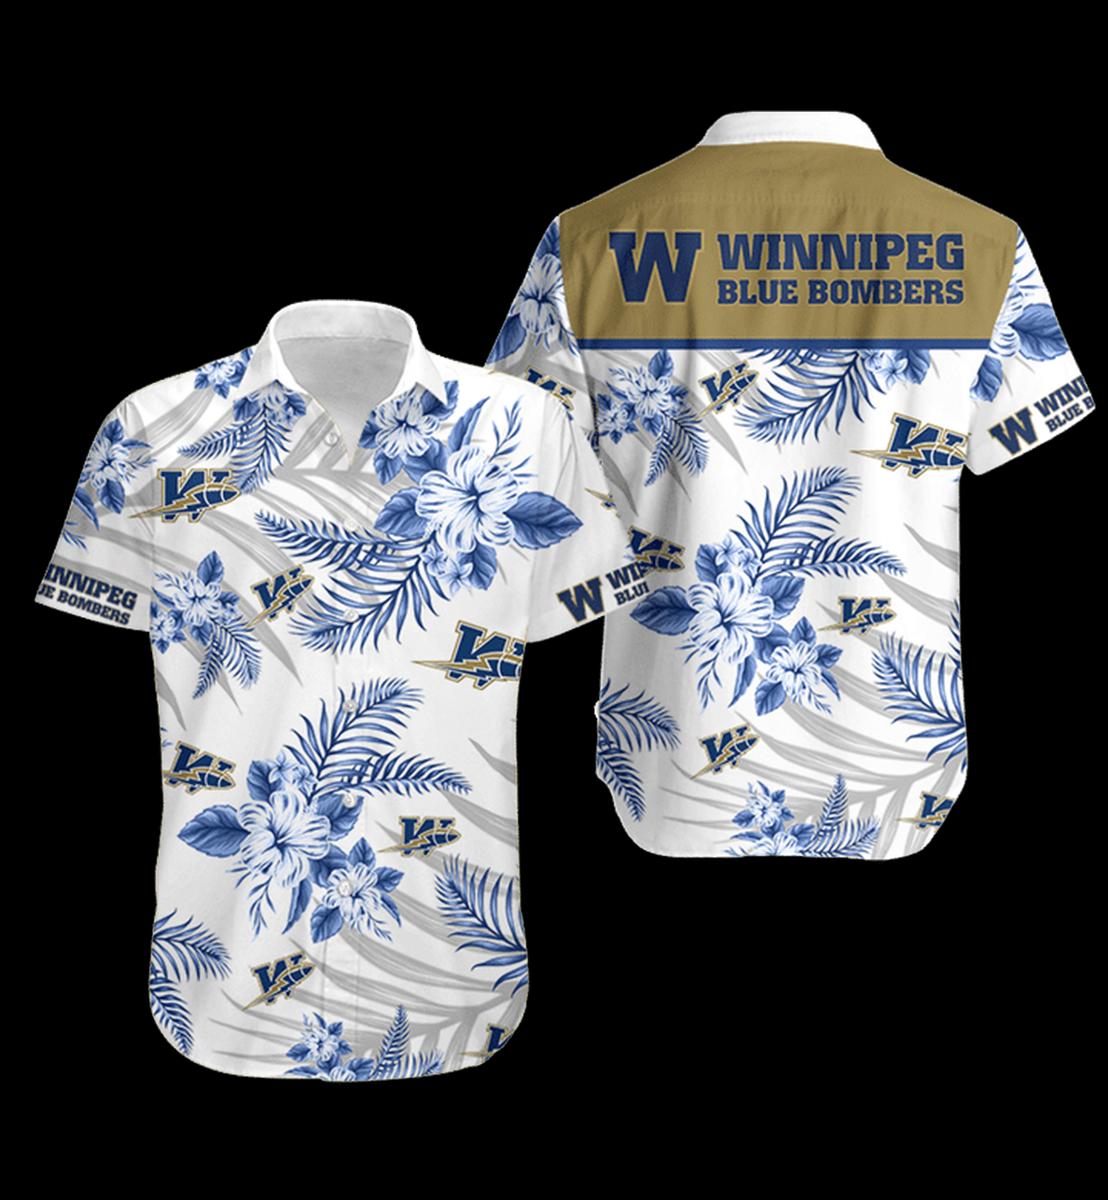 9 Winnipeg Blue Bombers Hawaiian Shirt 1 1